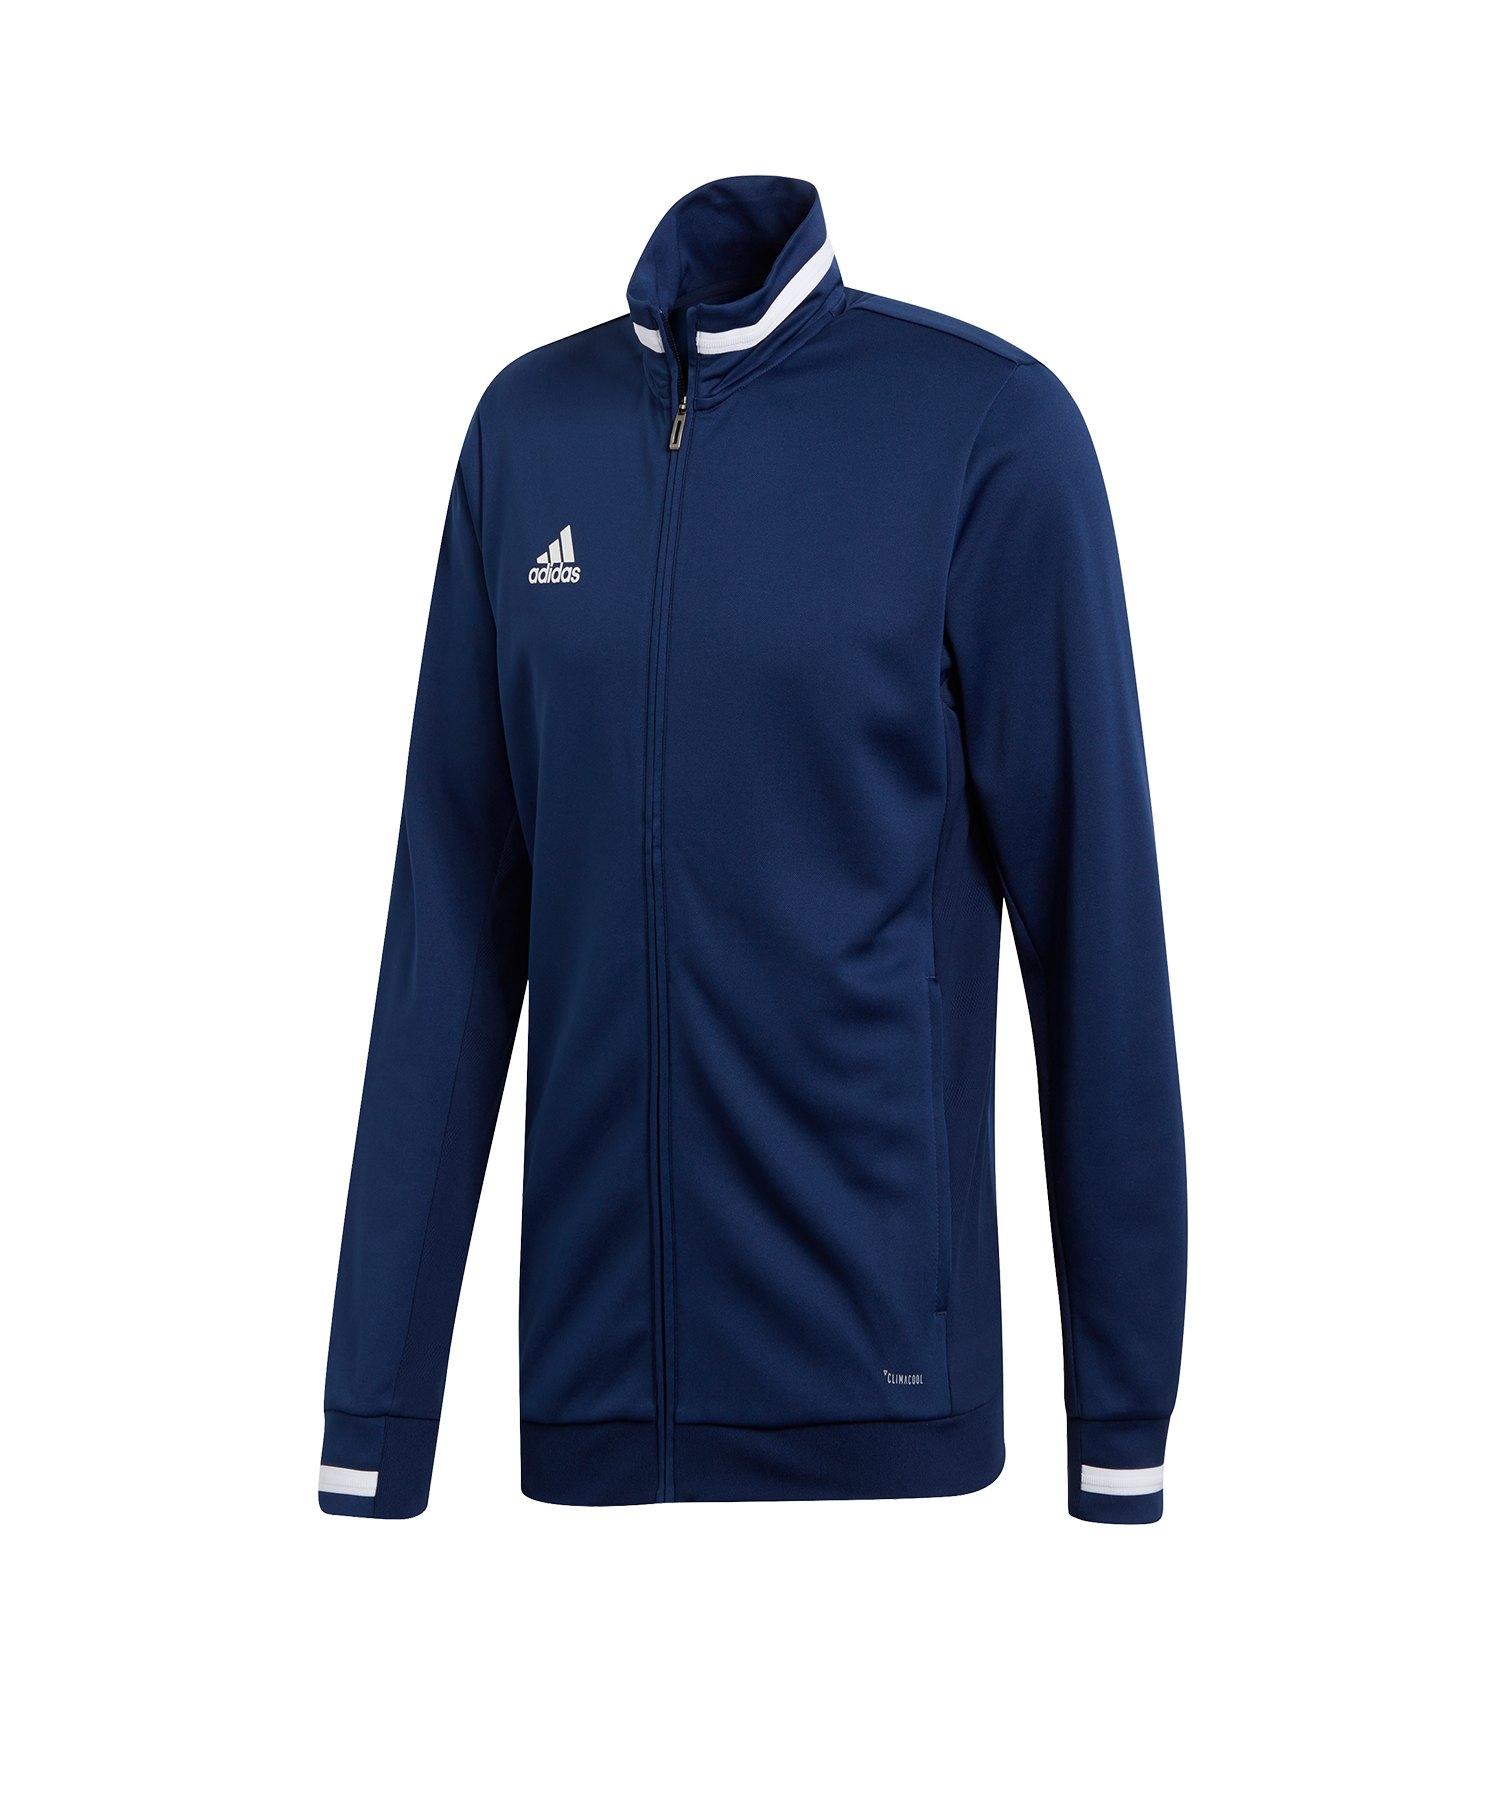 adidas Team 19 Track Jacket Jacke Blau Weiss - blau